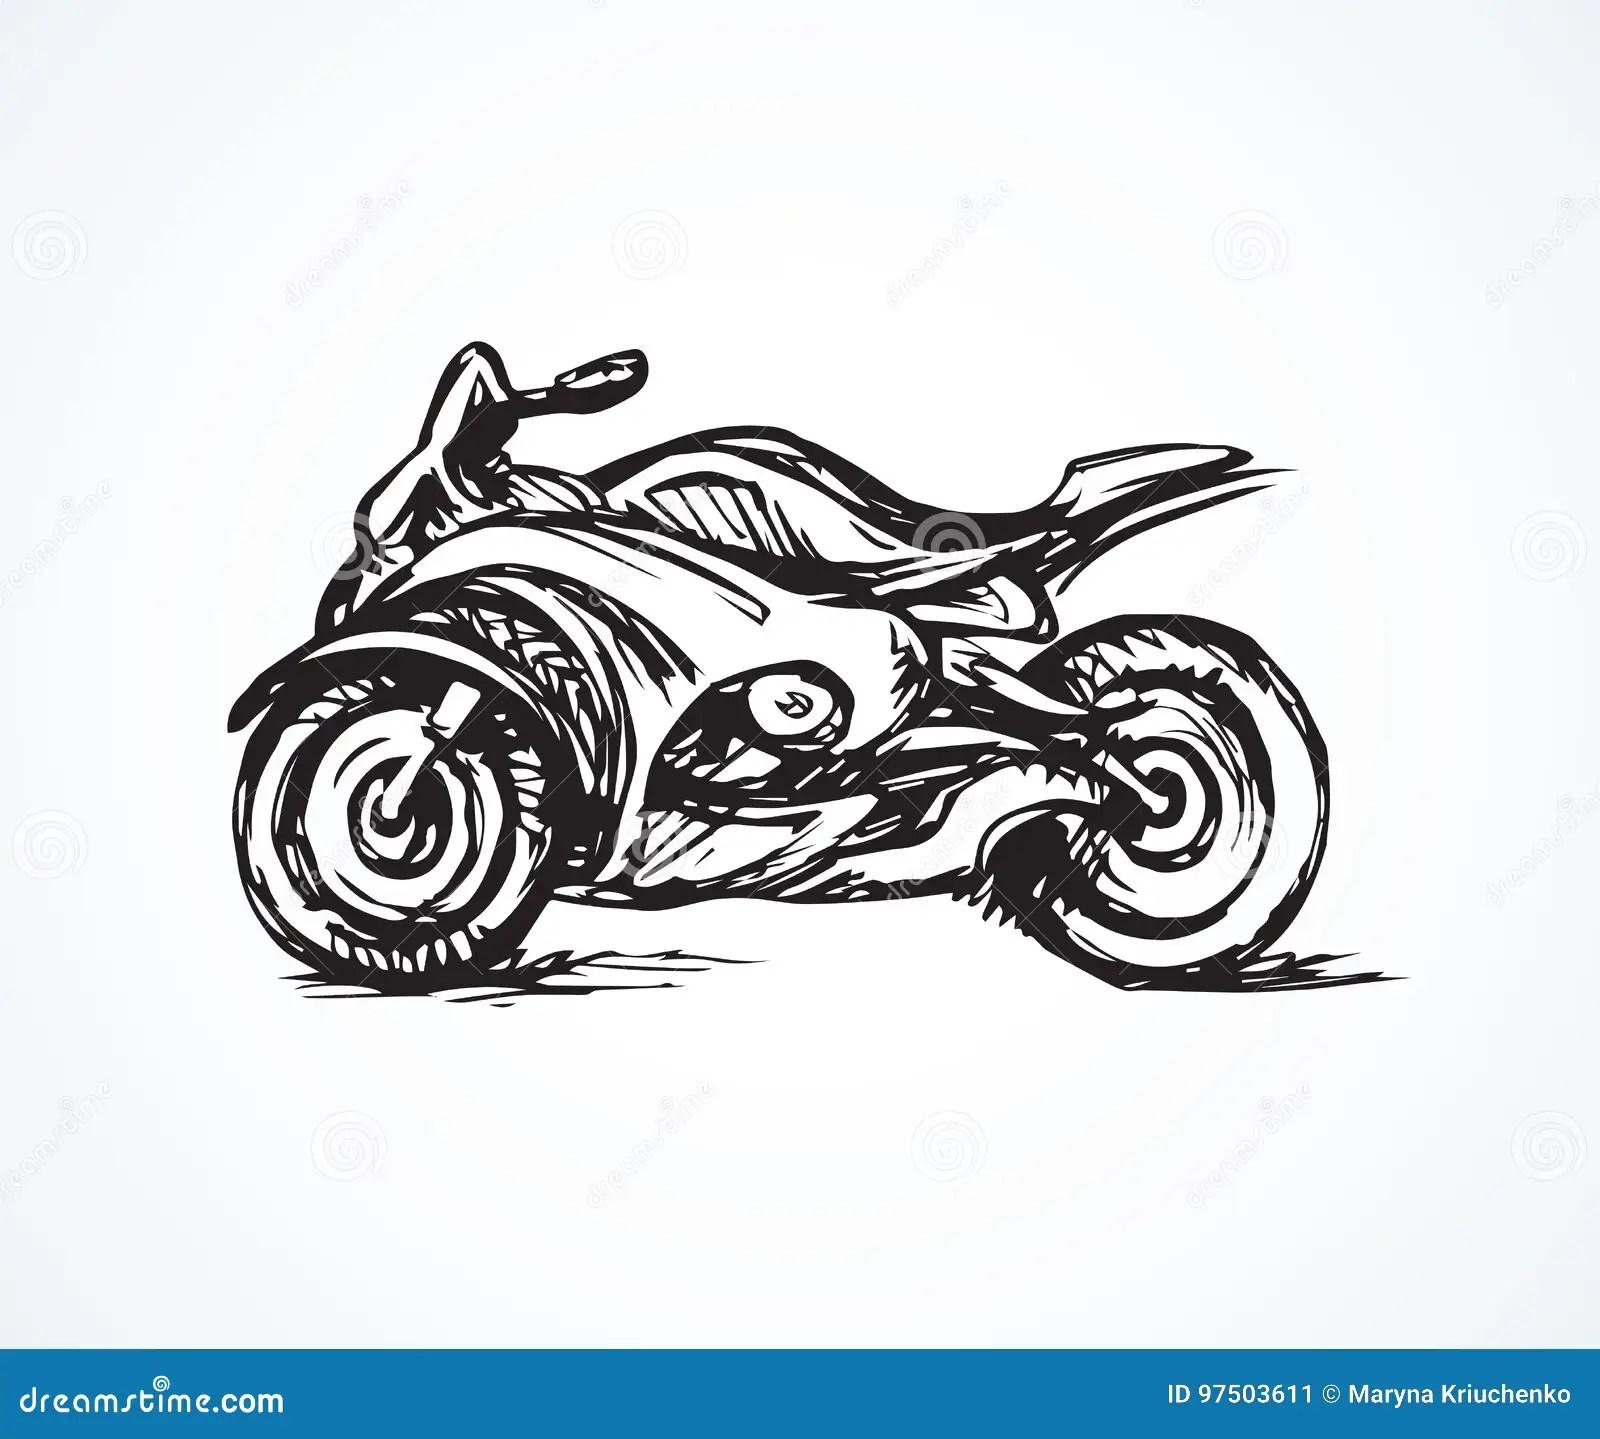 Sportbike Drawing